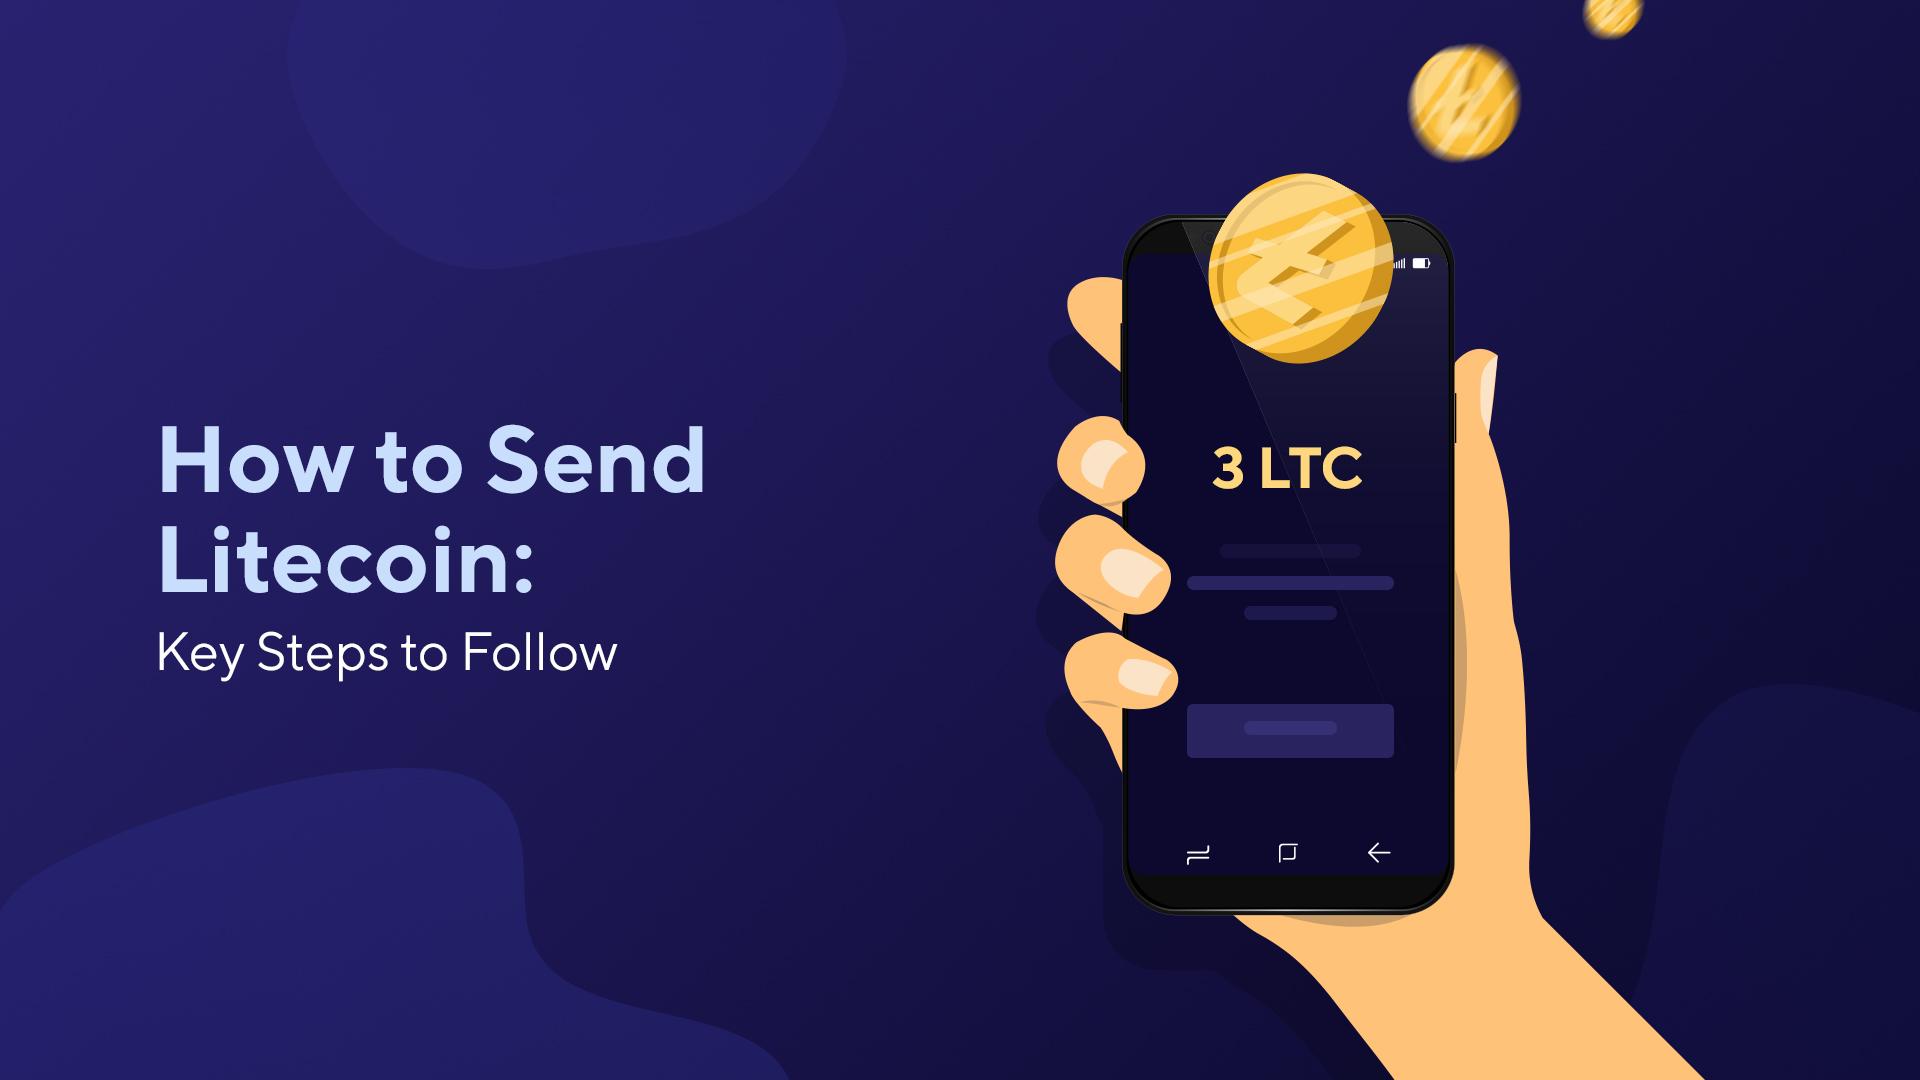 How to Send Litecoin: Key Steps to Follow